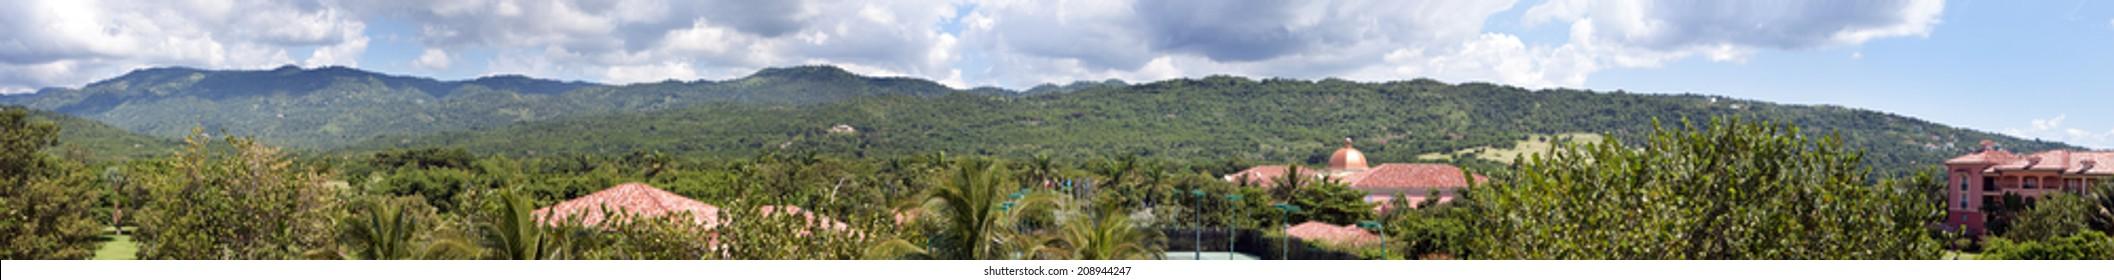 Jamaica. Panorama. View of mountains - Shutterstock ID 208944247